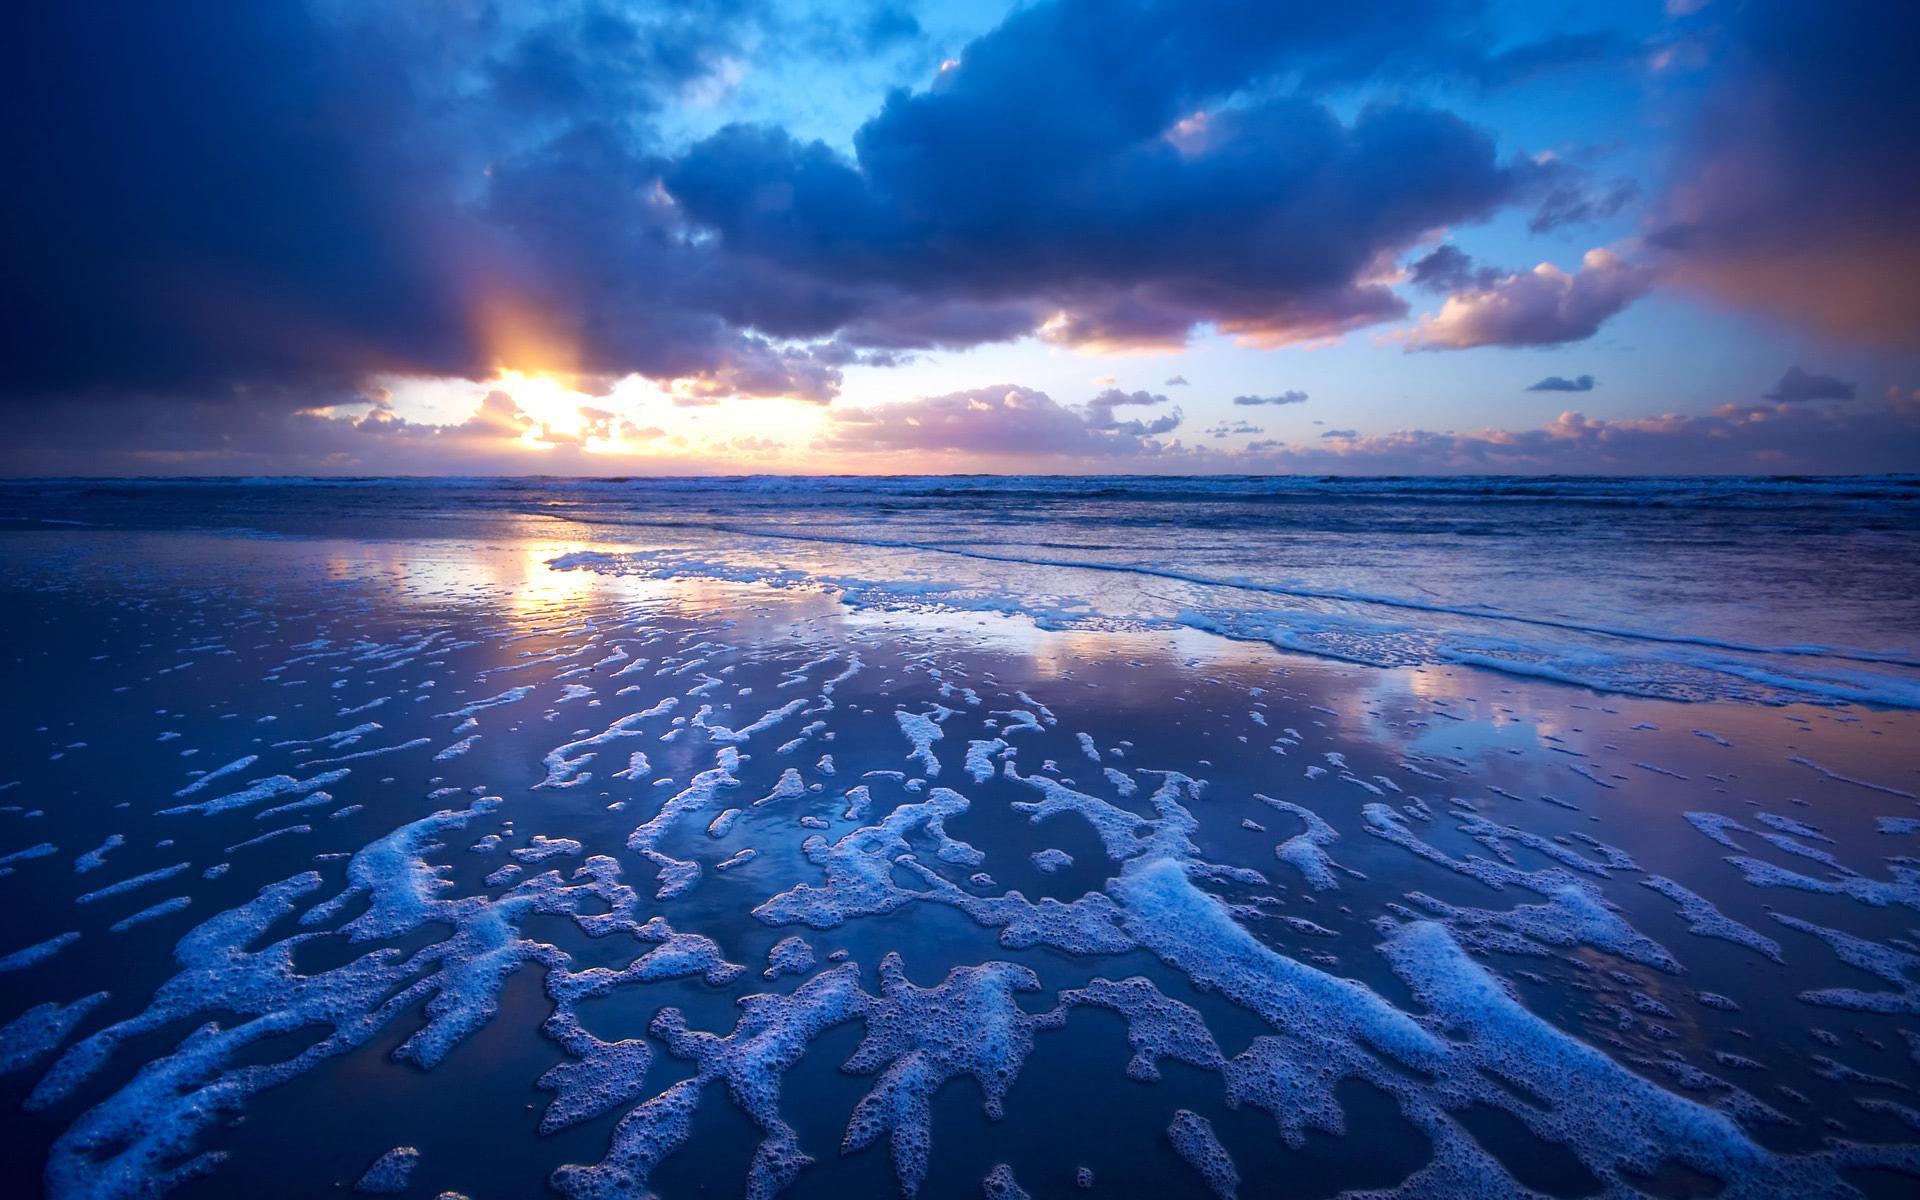 Best Wallpaper Macbook Wave - sunset-waves-wallpaper-1920x1200-373  You Should Have_259951.jpg